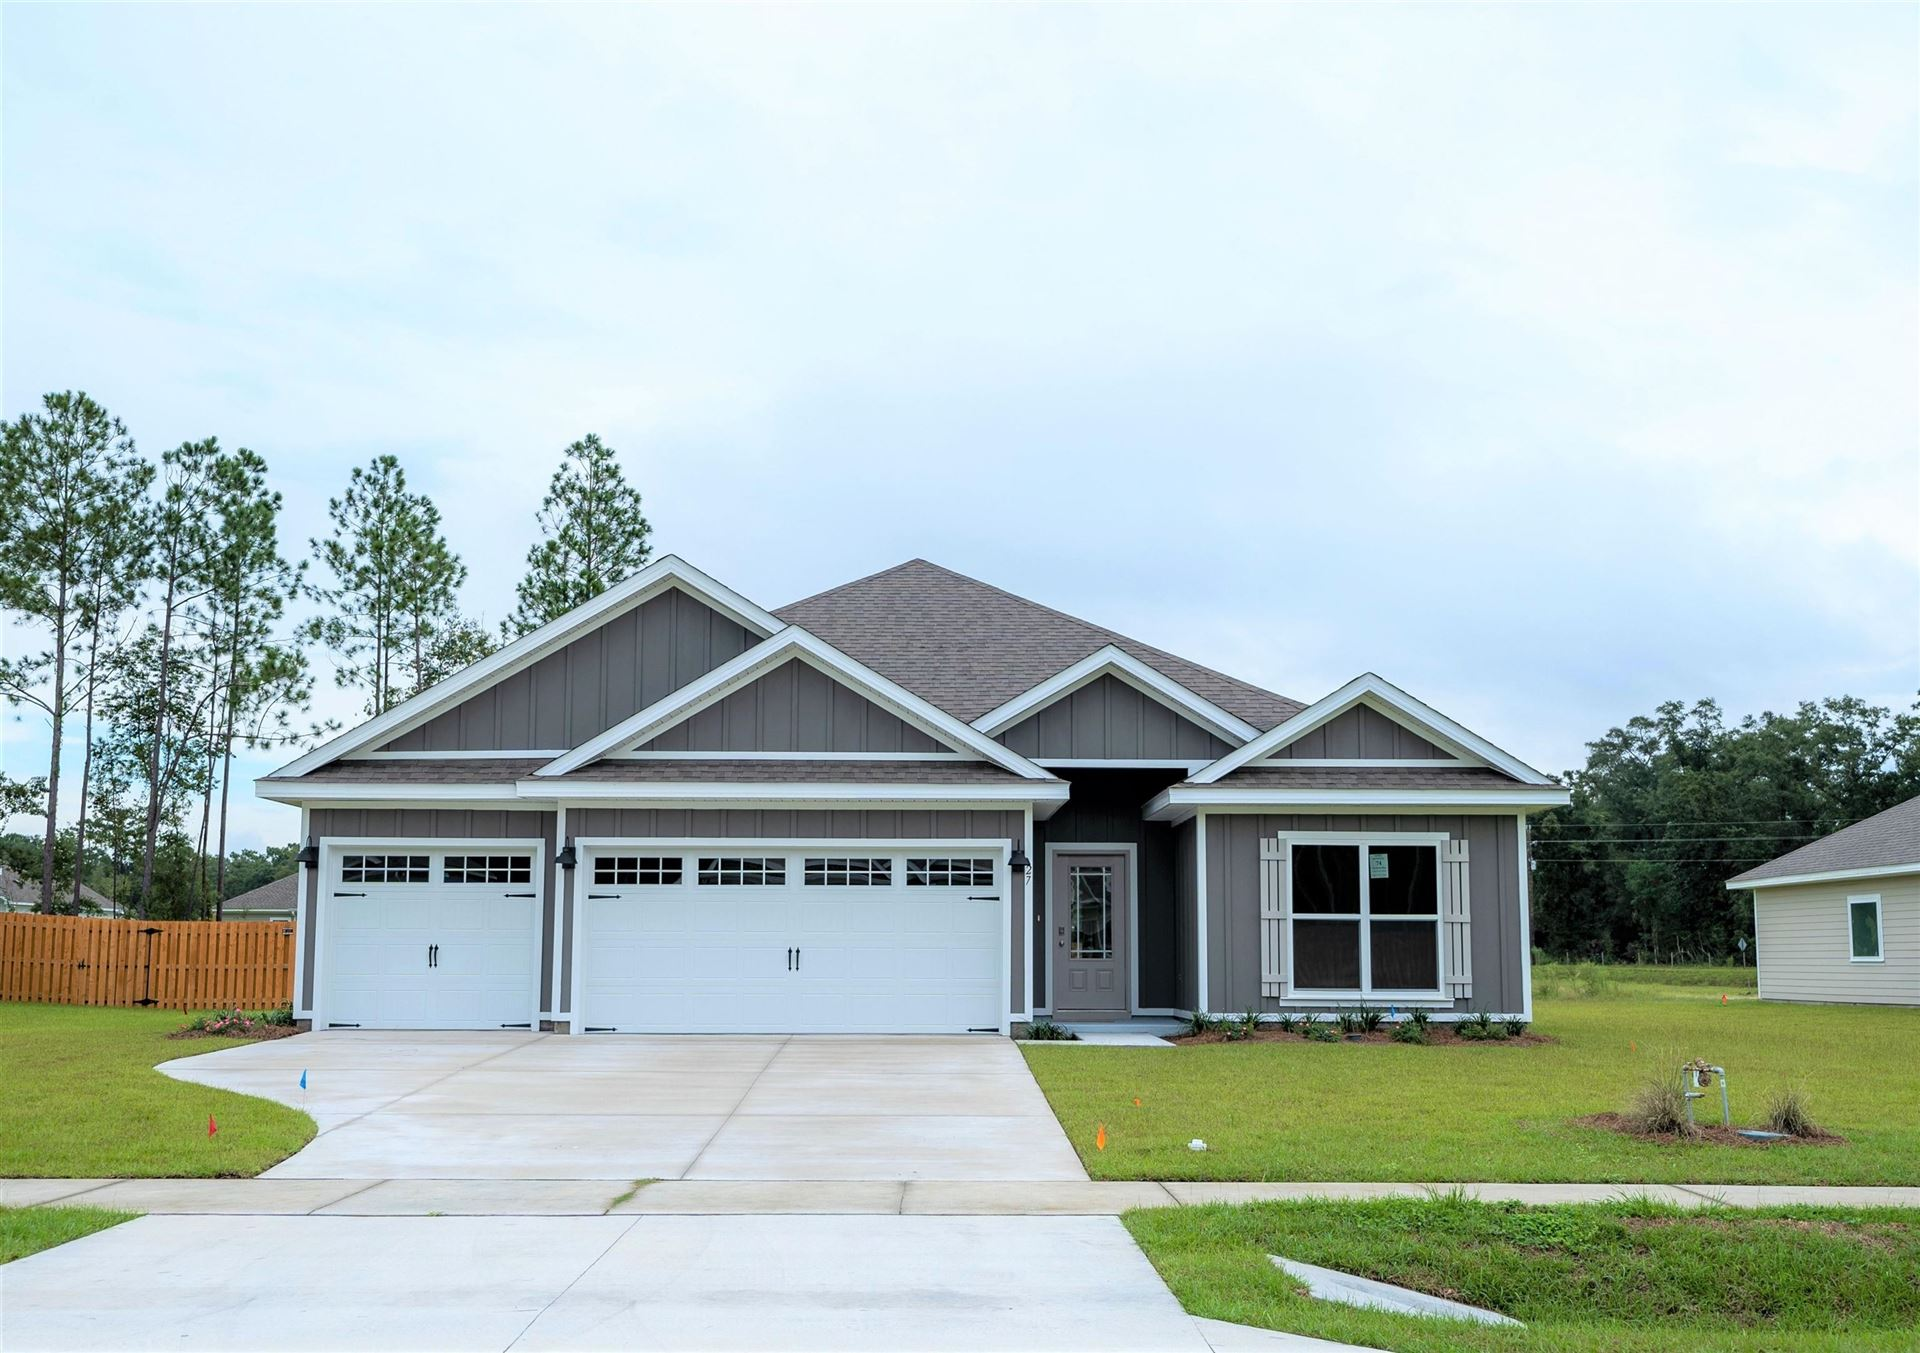 92 Manchester Drive, Crawfordville, FL 32327 - MLS#: 335705